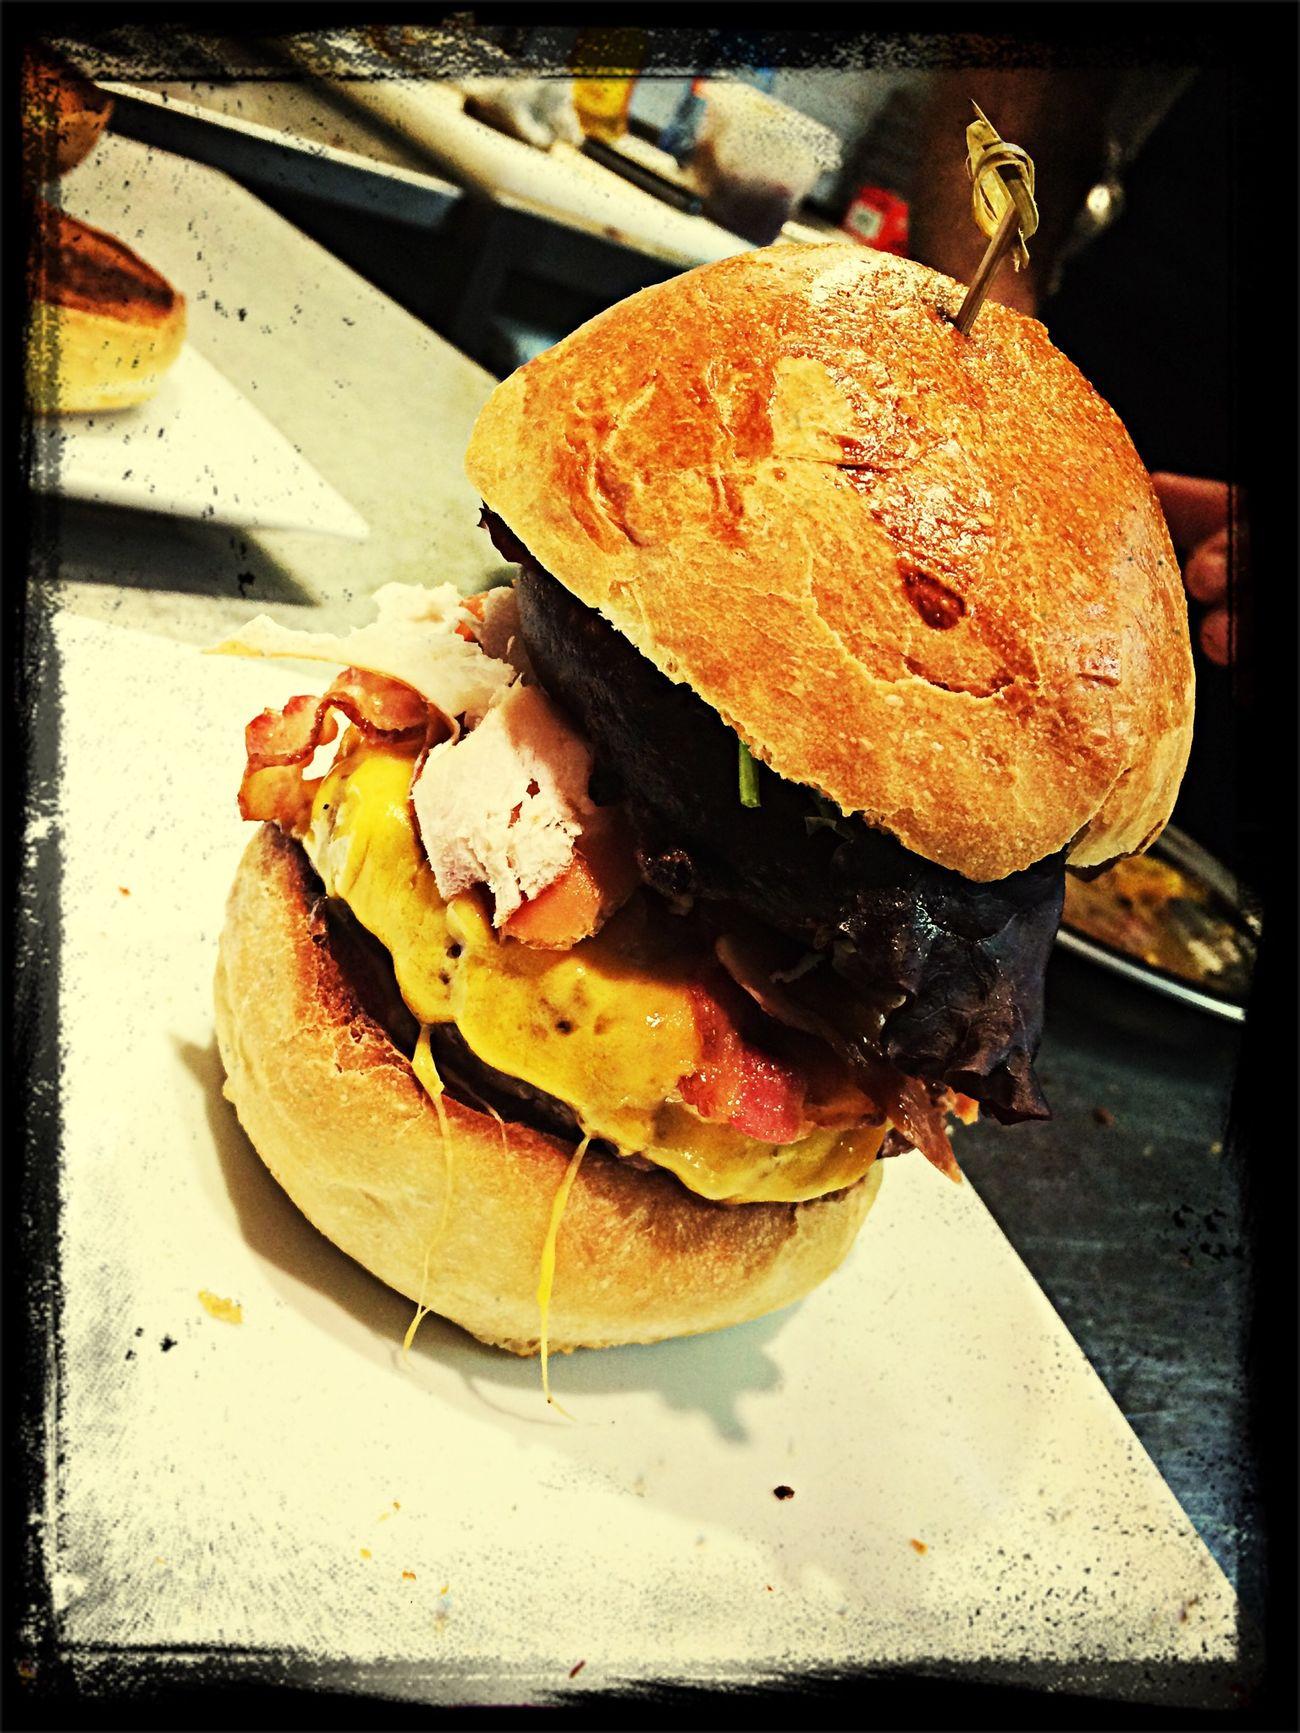 Smack that burger!!!